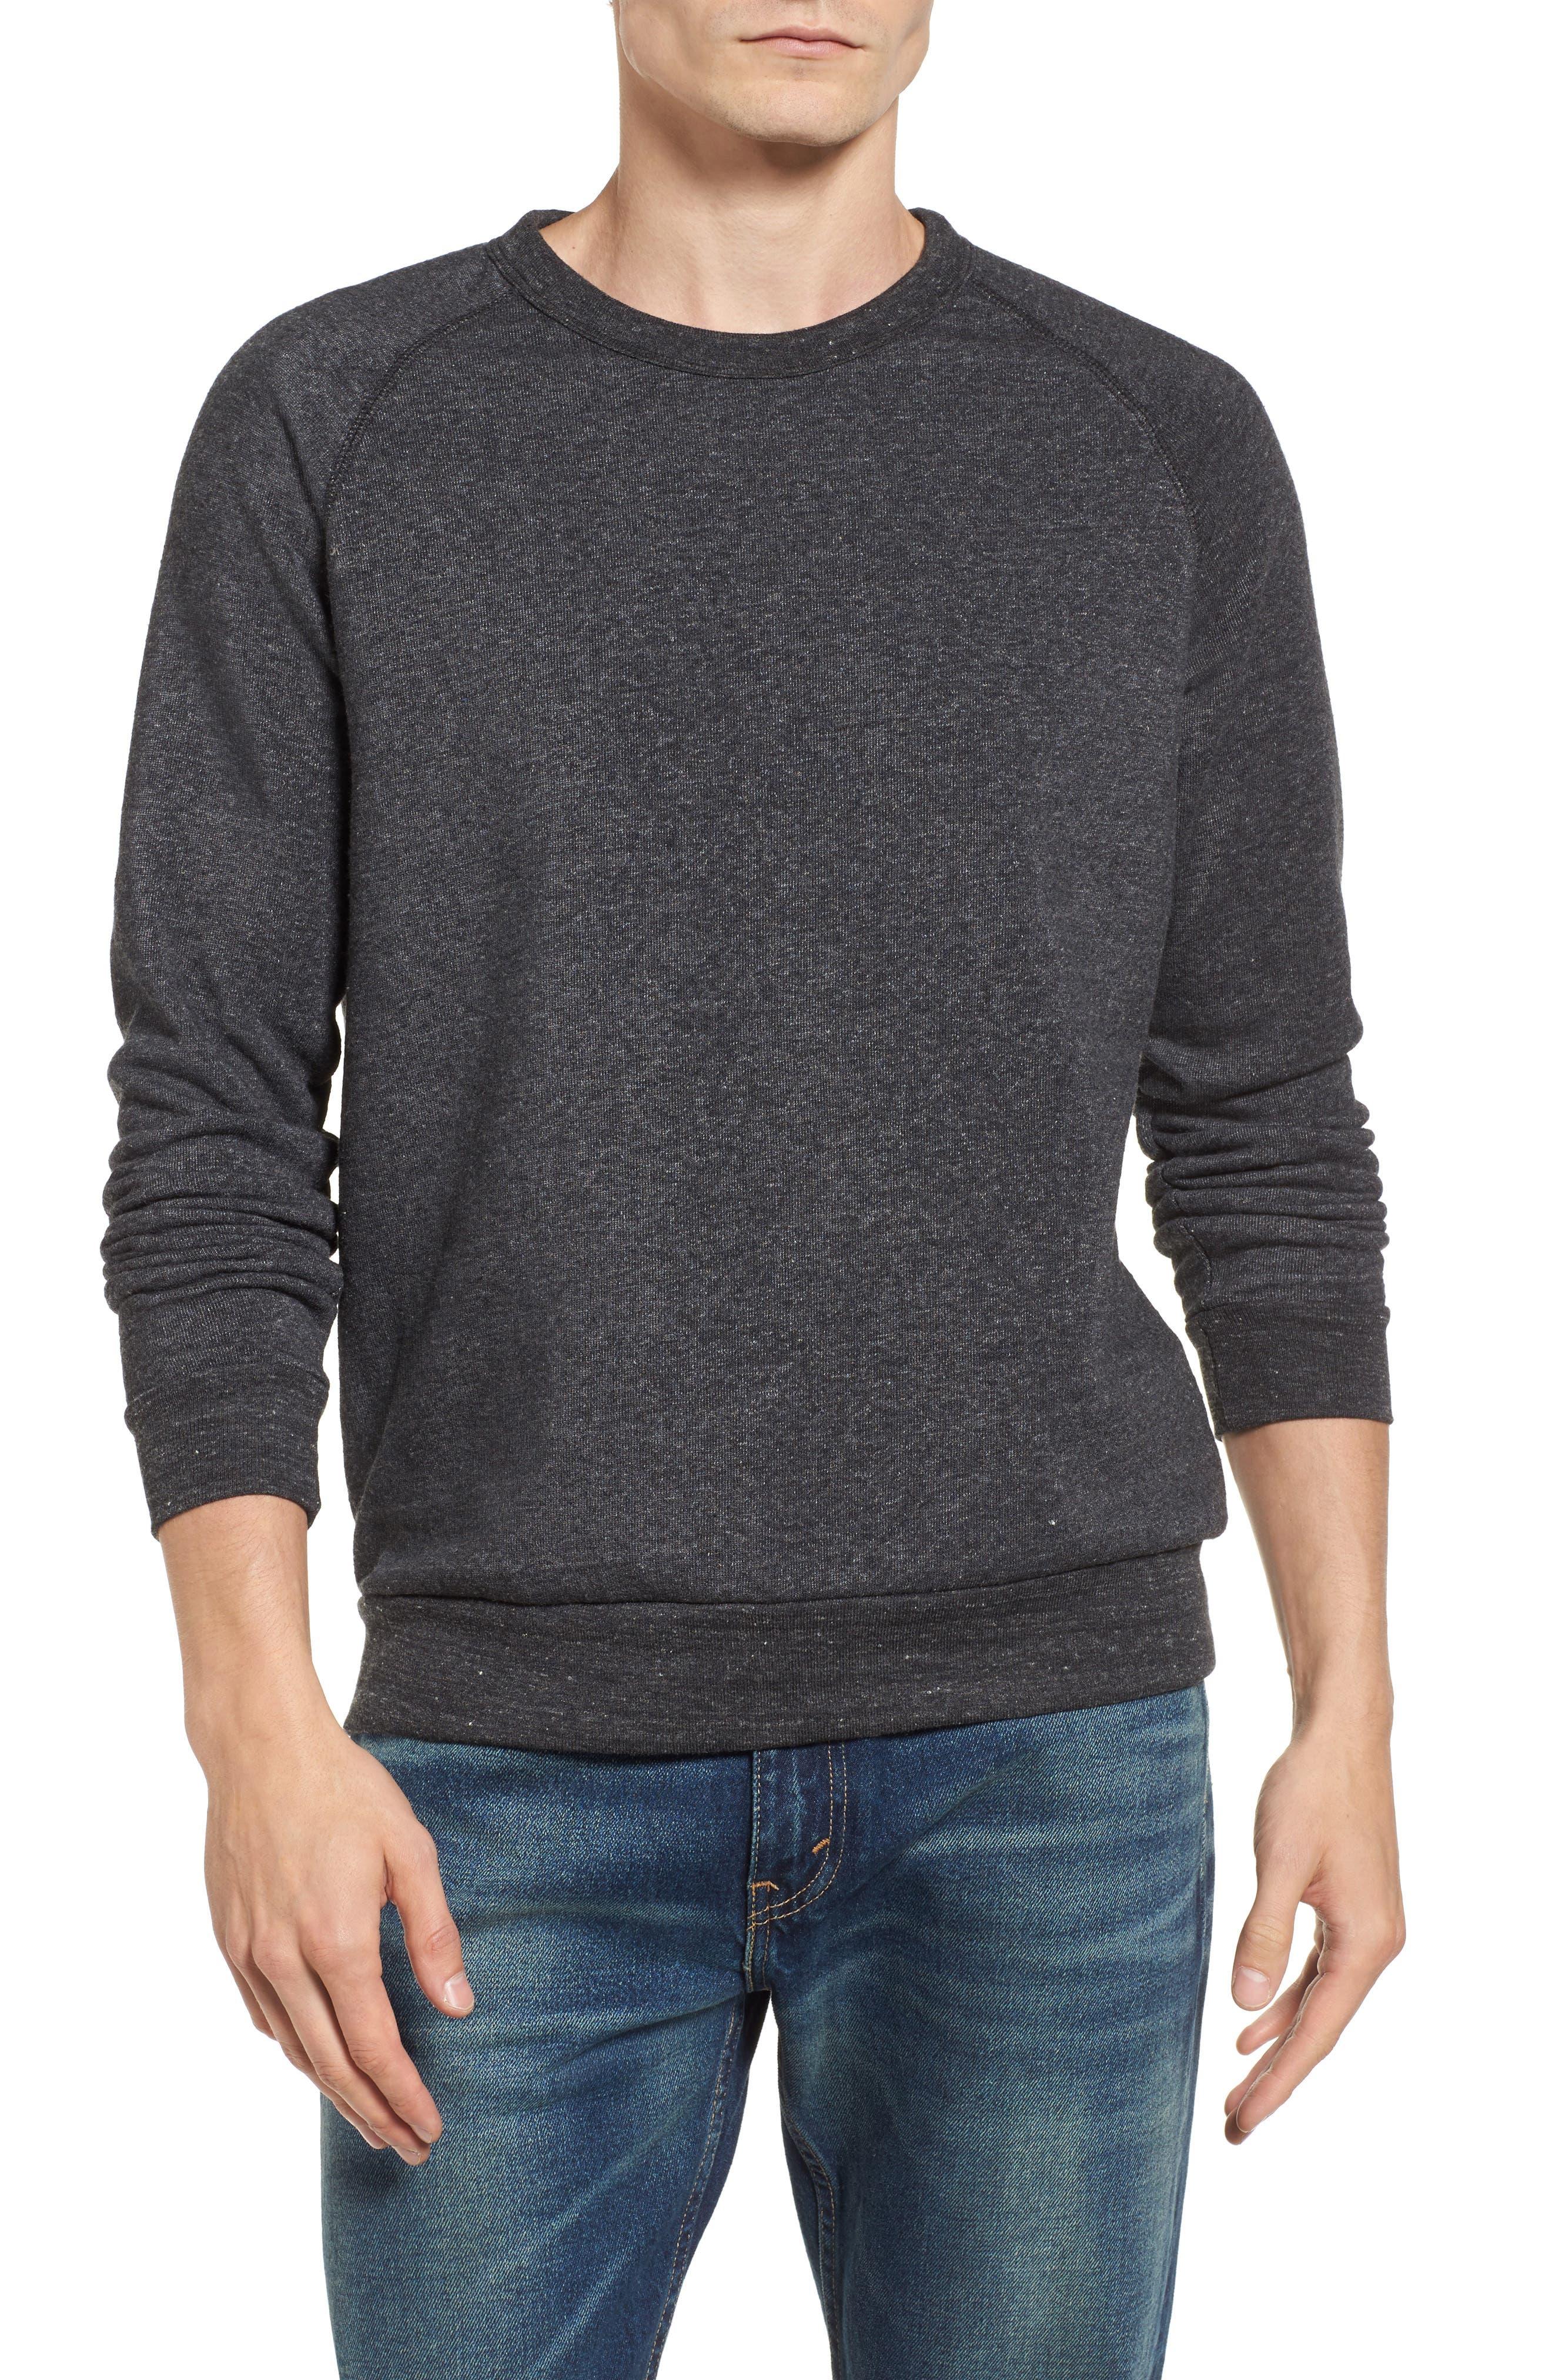 'The Champ' Sweatshirt,                             Main thumbnail 1, color,                             010